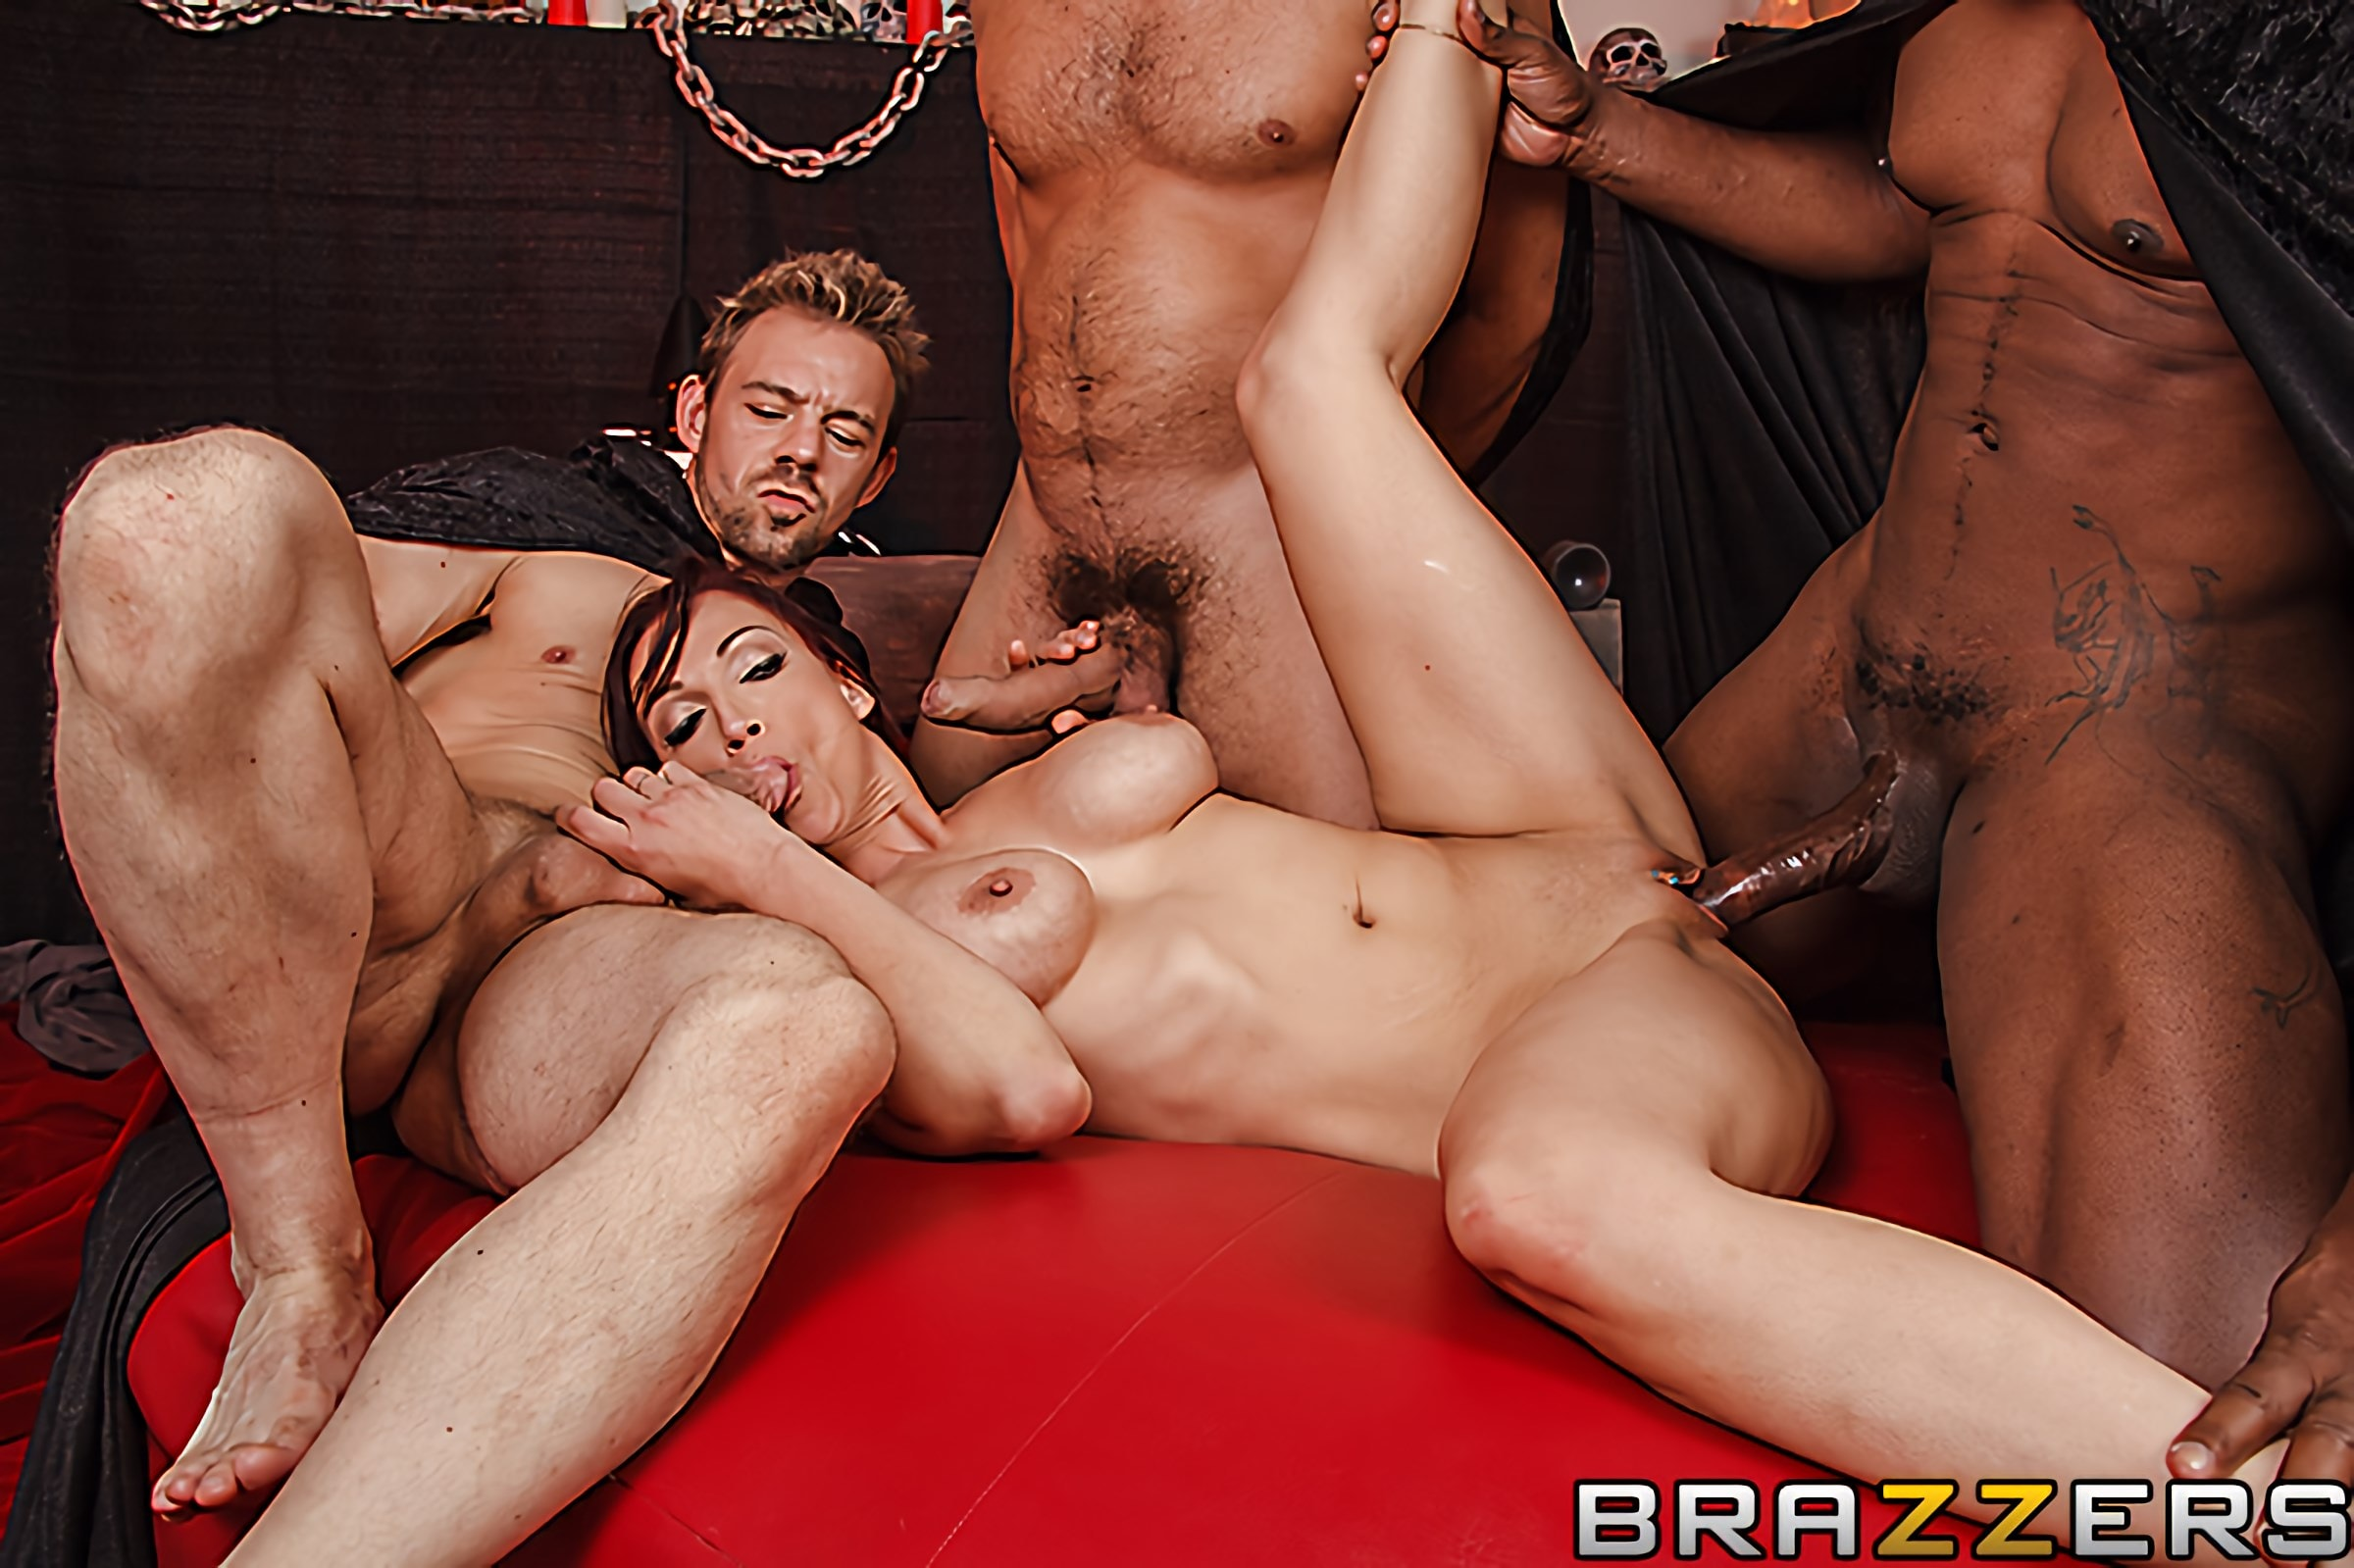 photos of hardcore sex № 707498